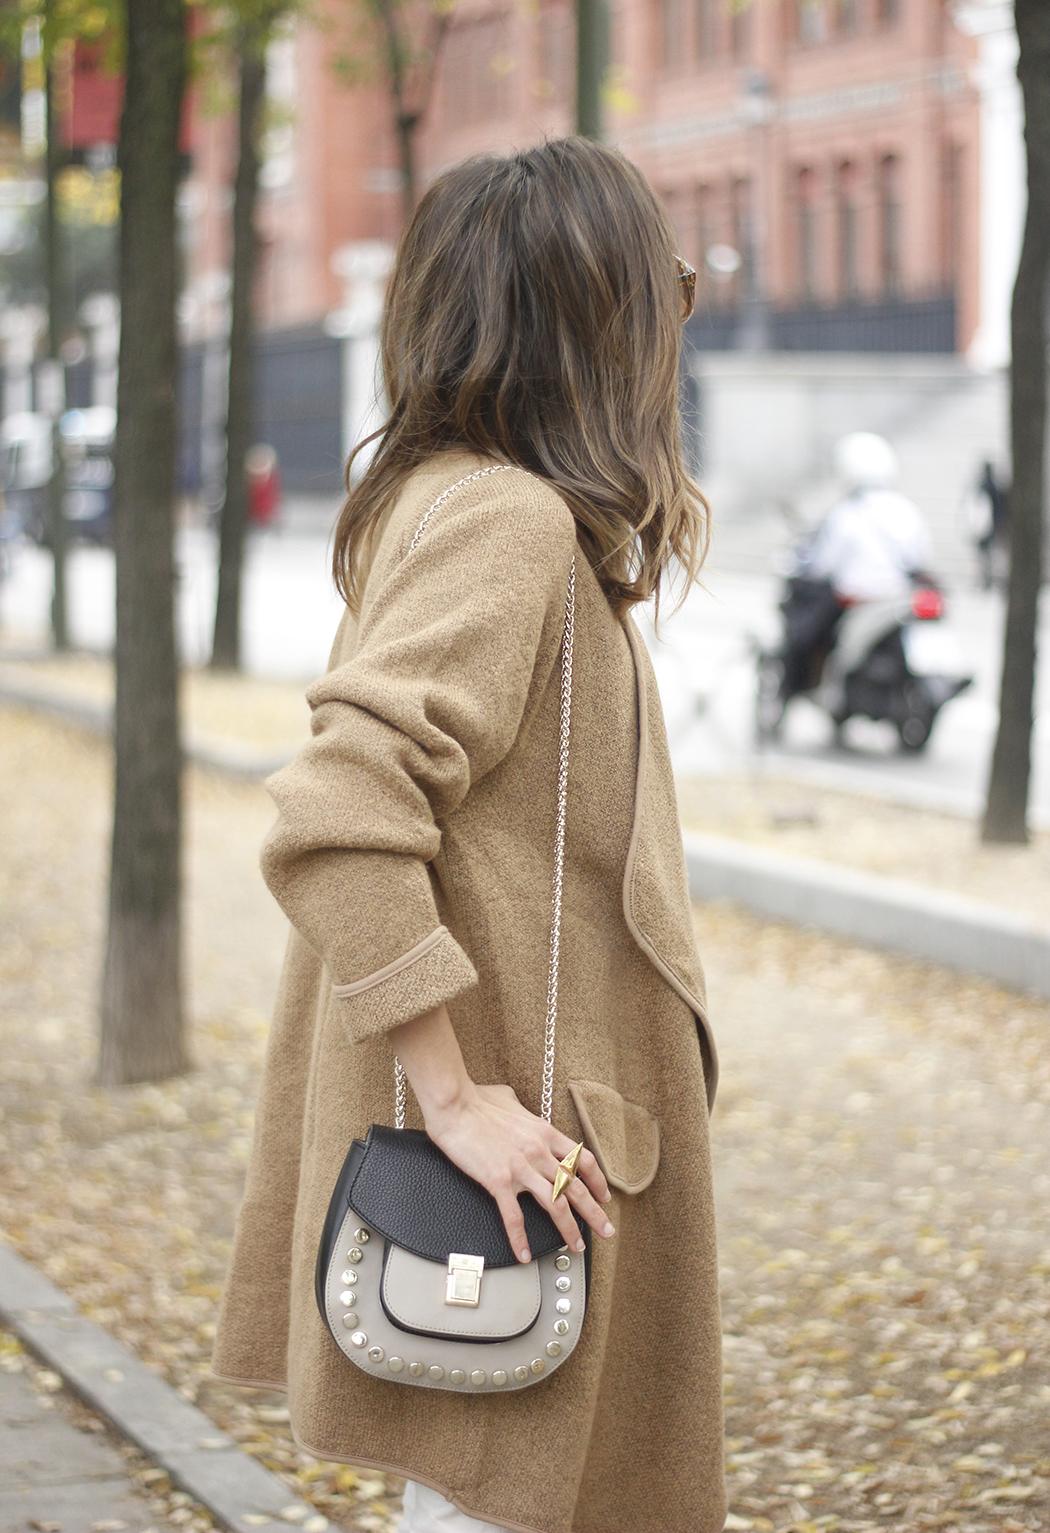 Camel Coat sheinside white outfit heels uterqüe purse outfit09